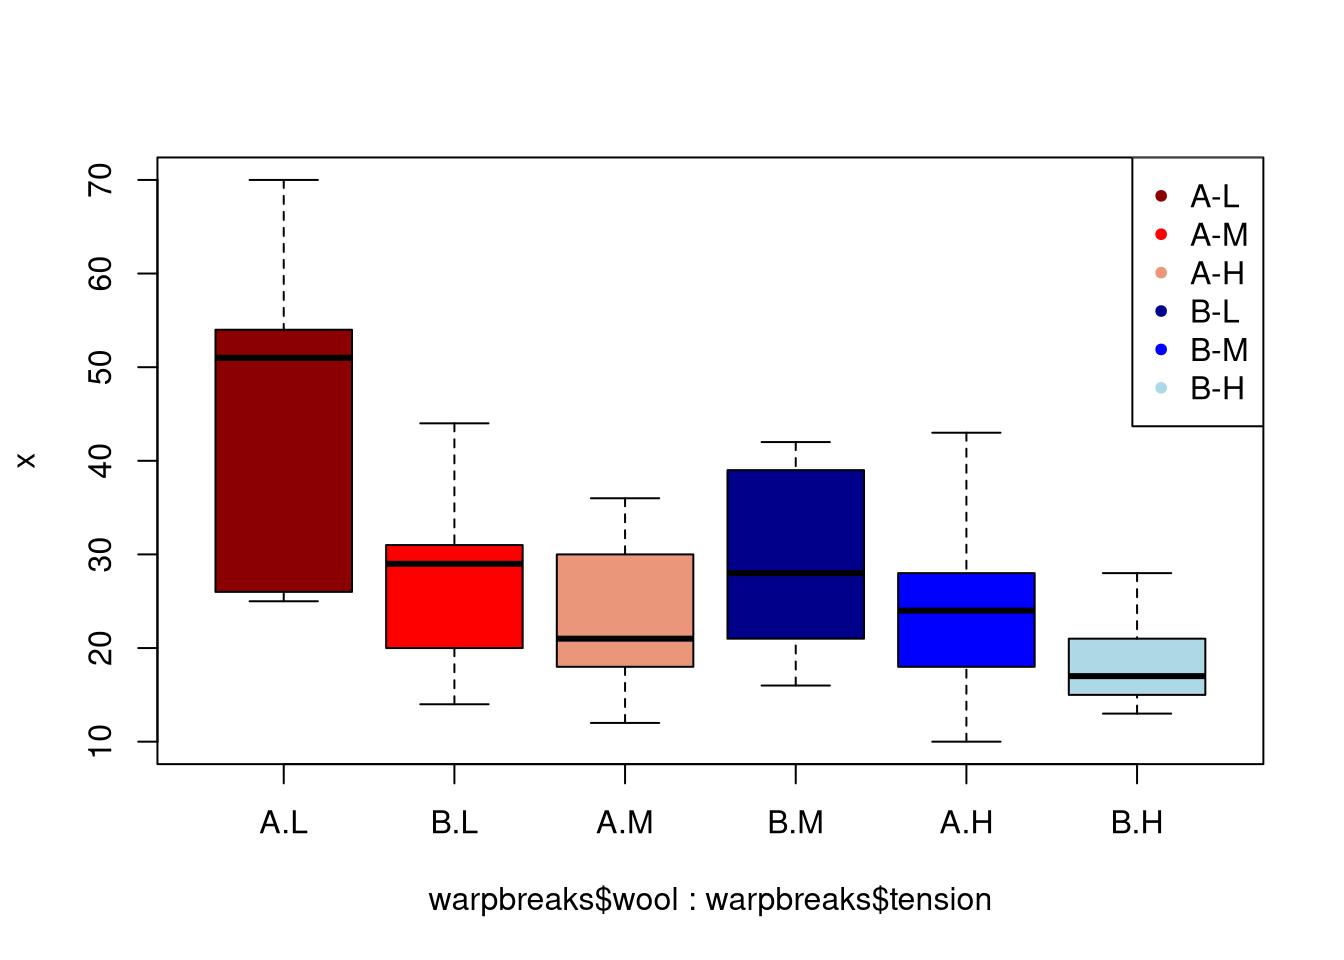 Comparing Medians and Inter-Quartile Ranges Using the Box Plot